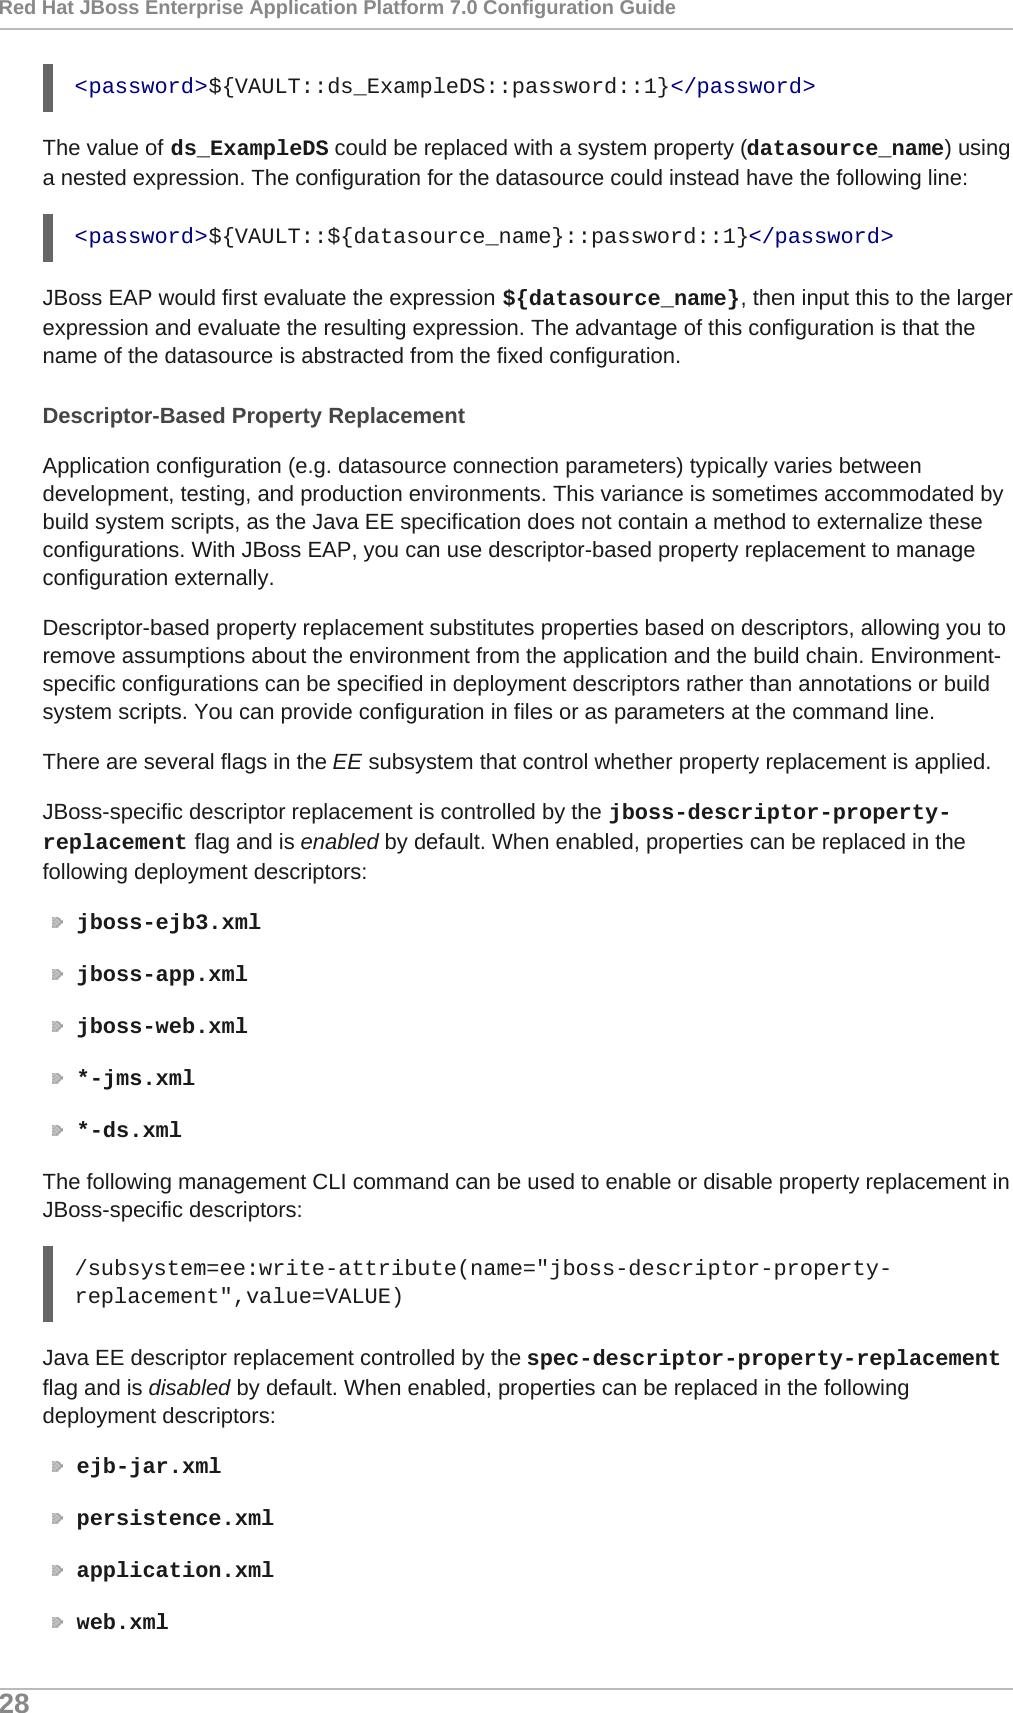 Red Hat JBoss Enterprise Application Platform 7 0